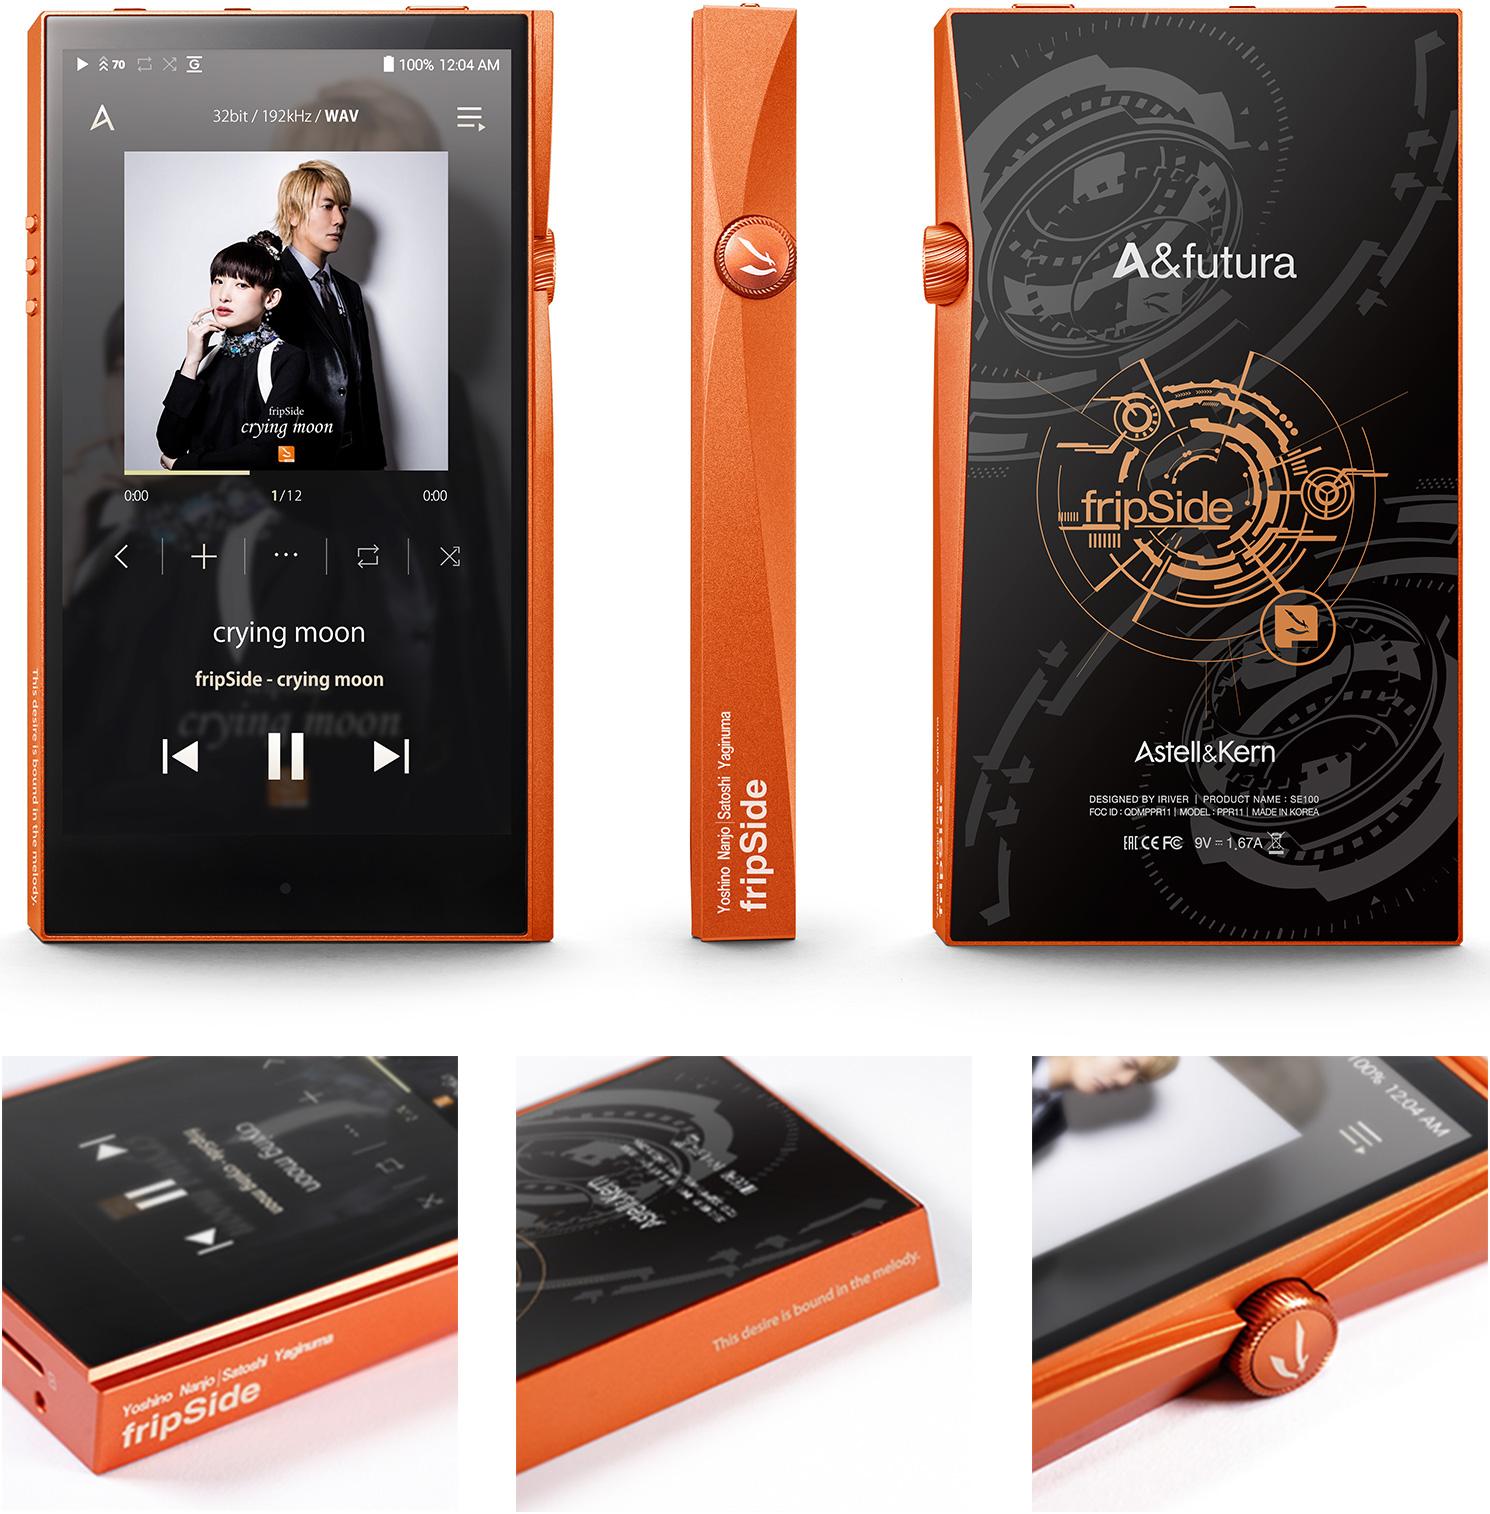 A&futura SE100 fripSide Edition